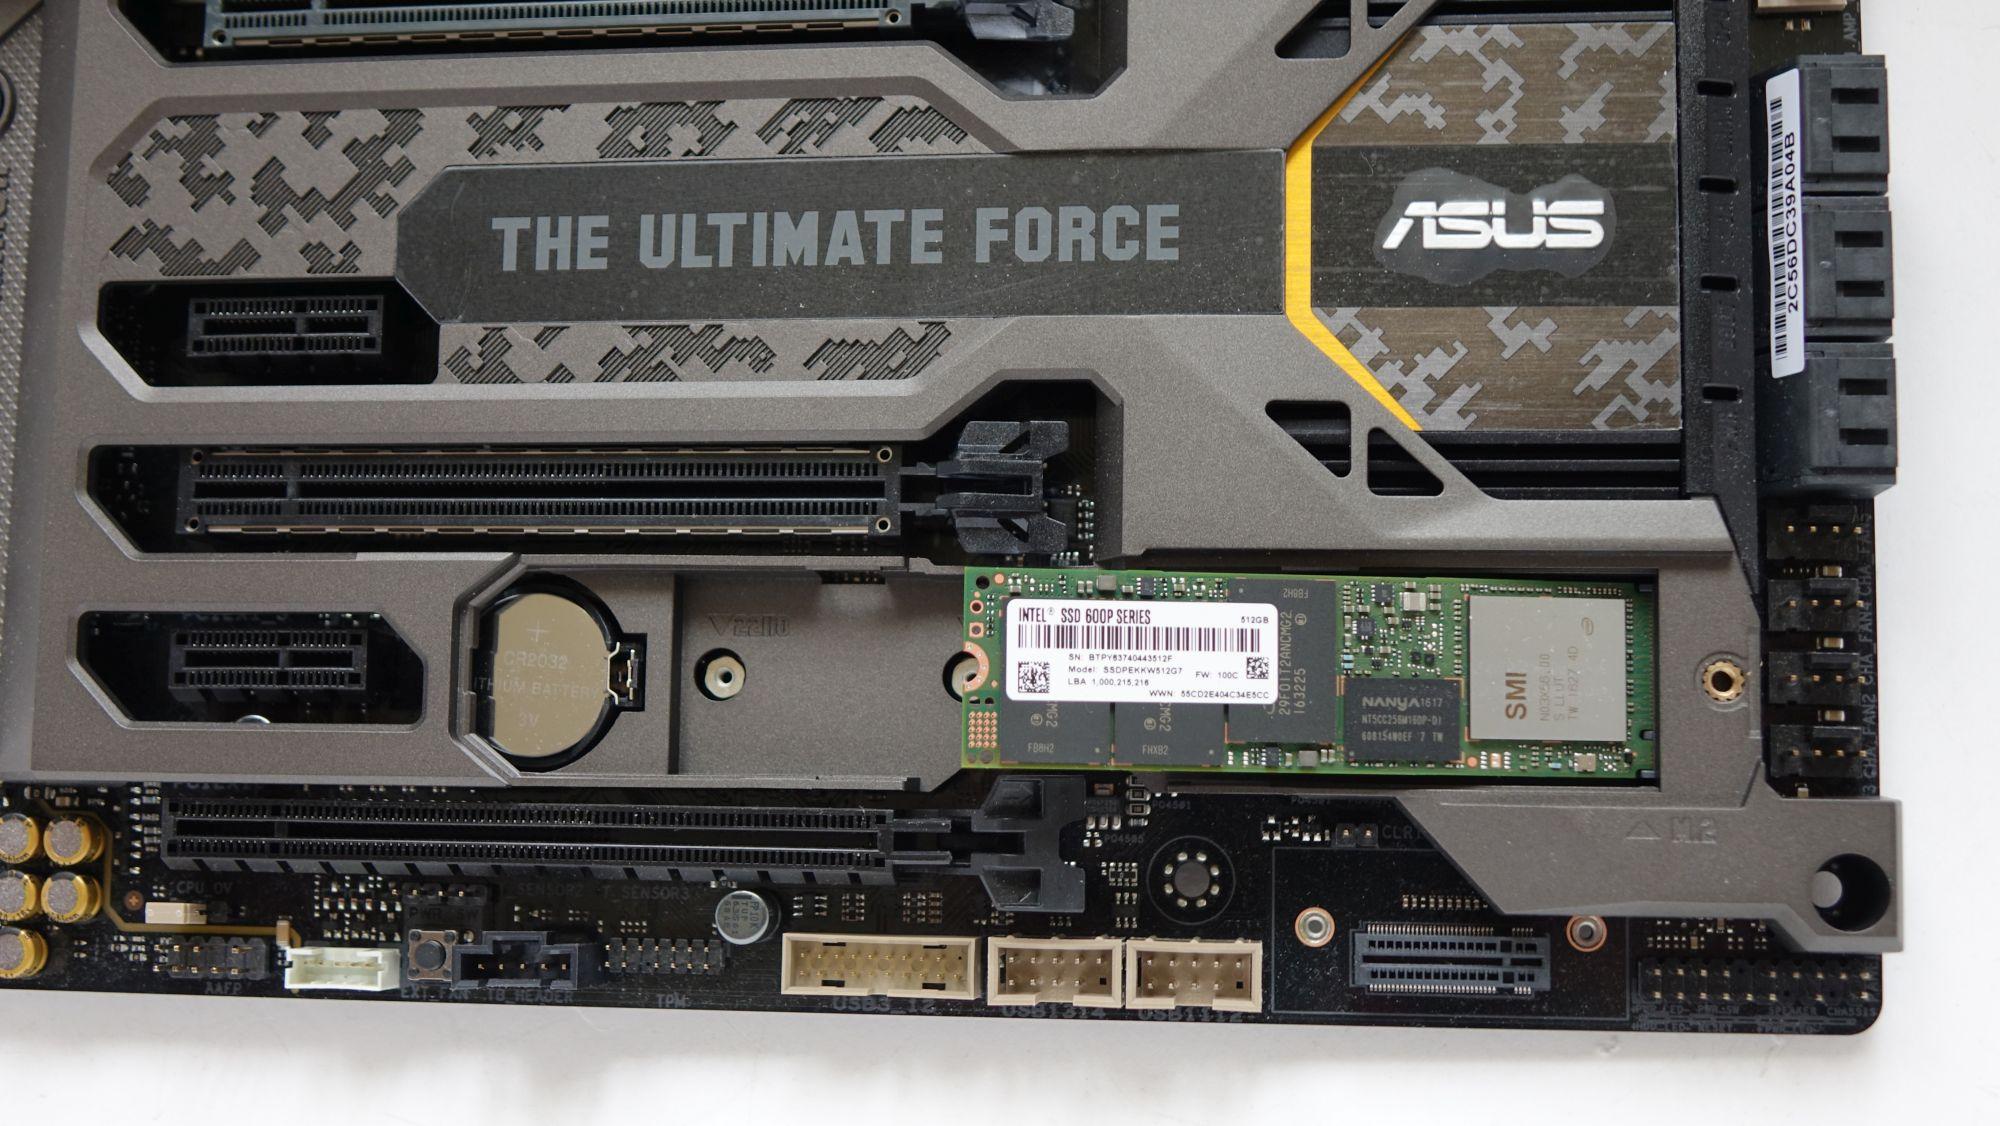 ASUS TUF Z270 Mark 1 и intel ssd 600p